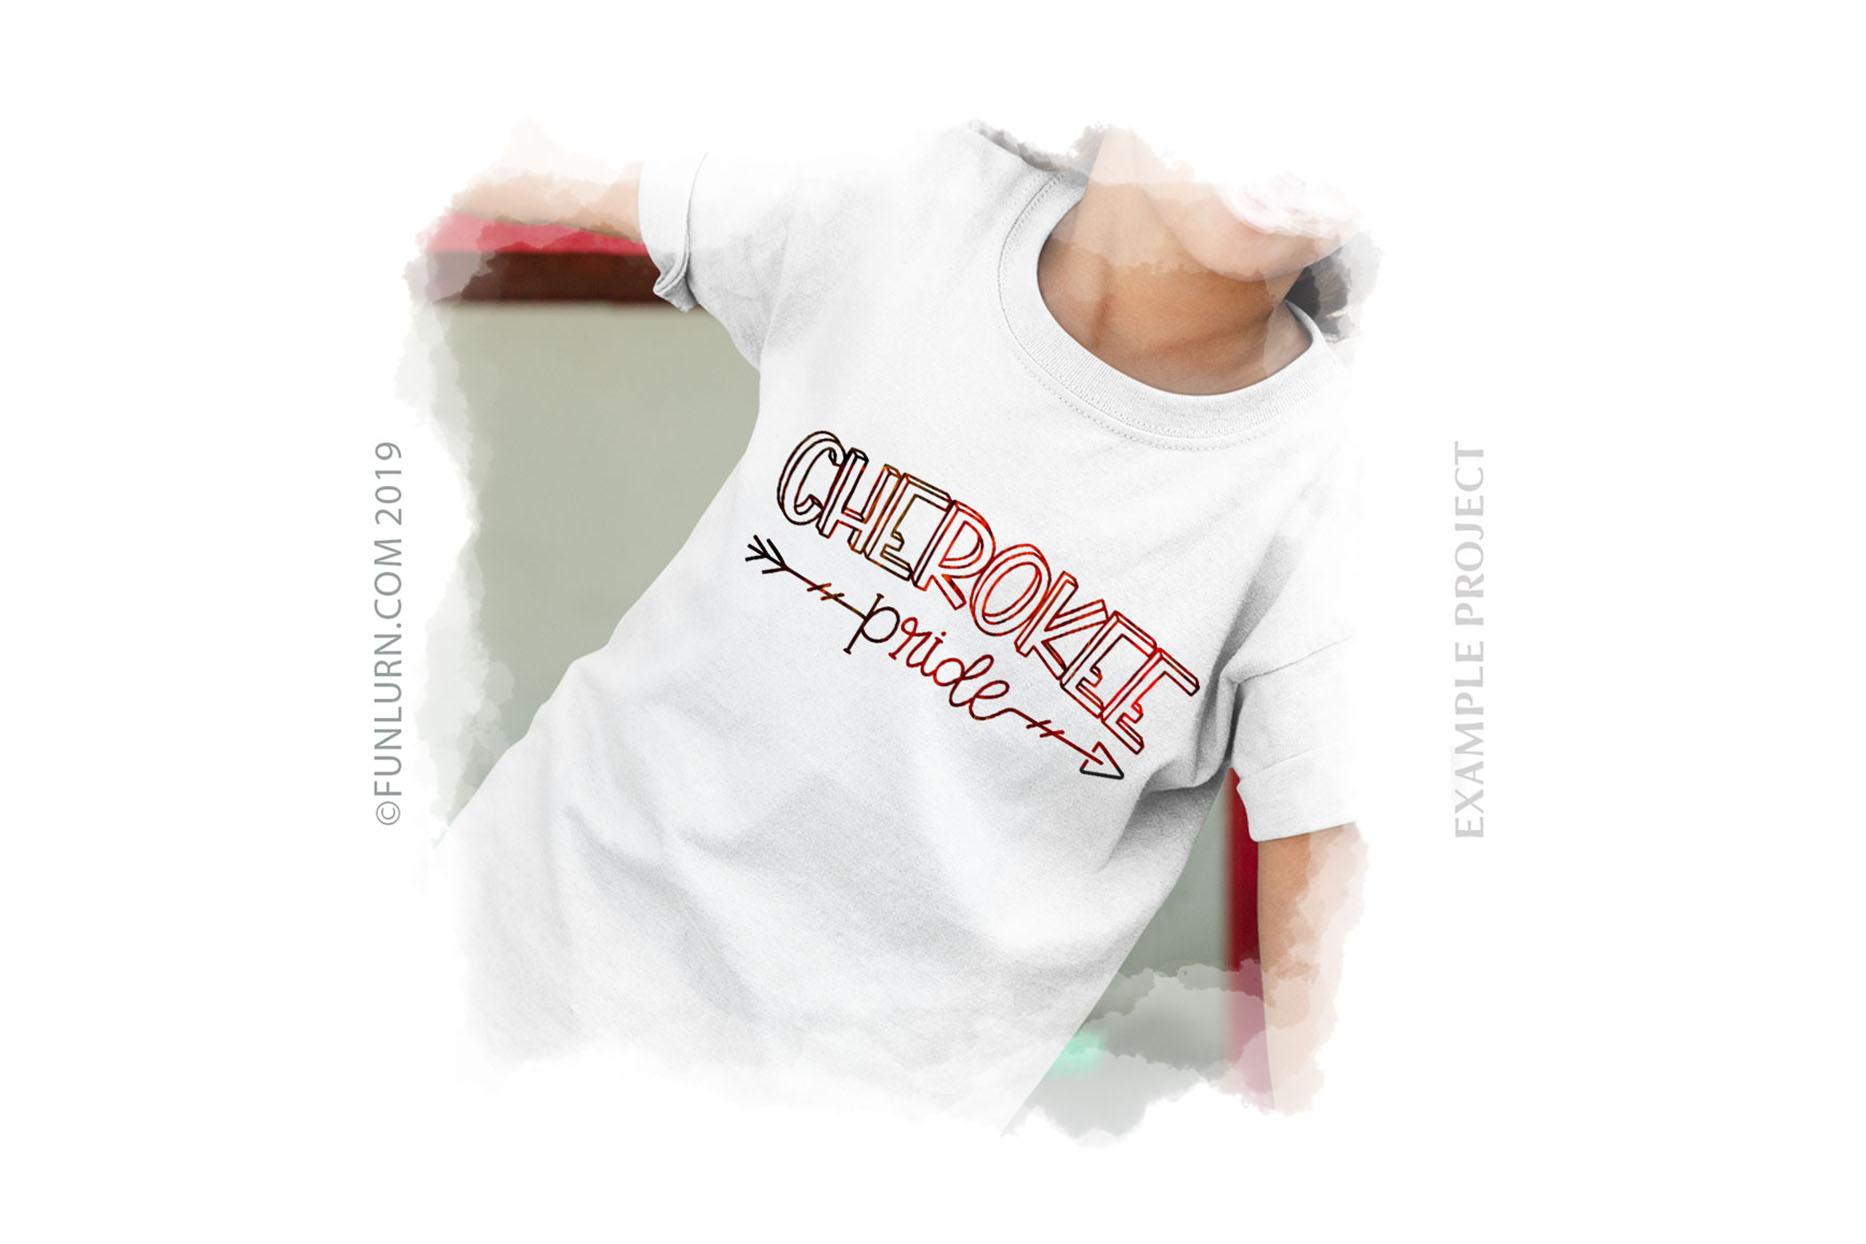 Cherokee Pride Team SVG Cut File example image 3